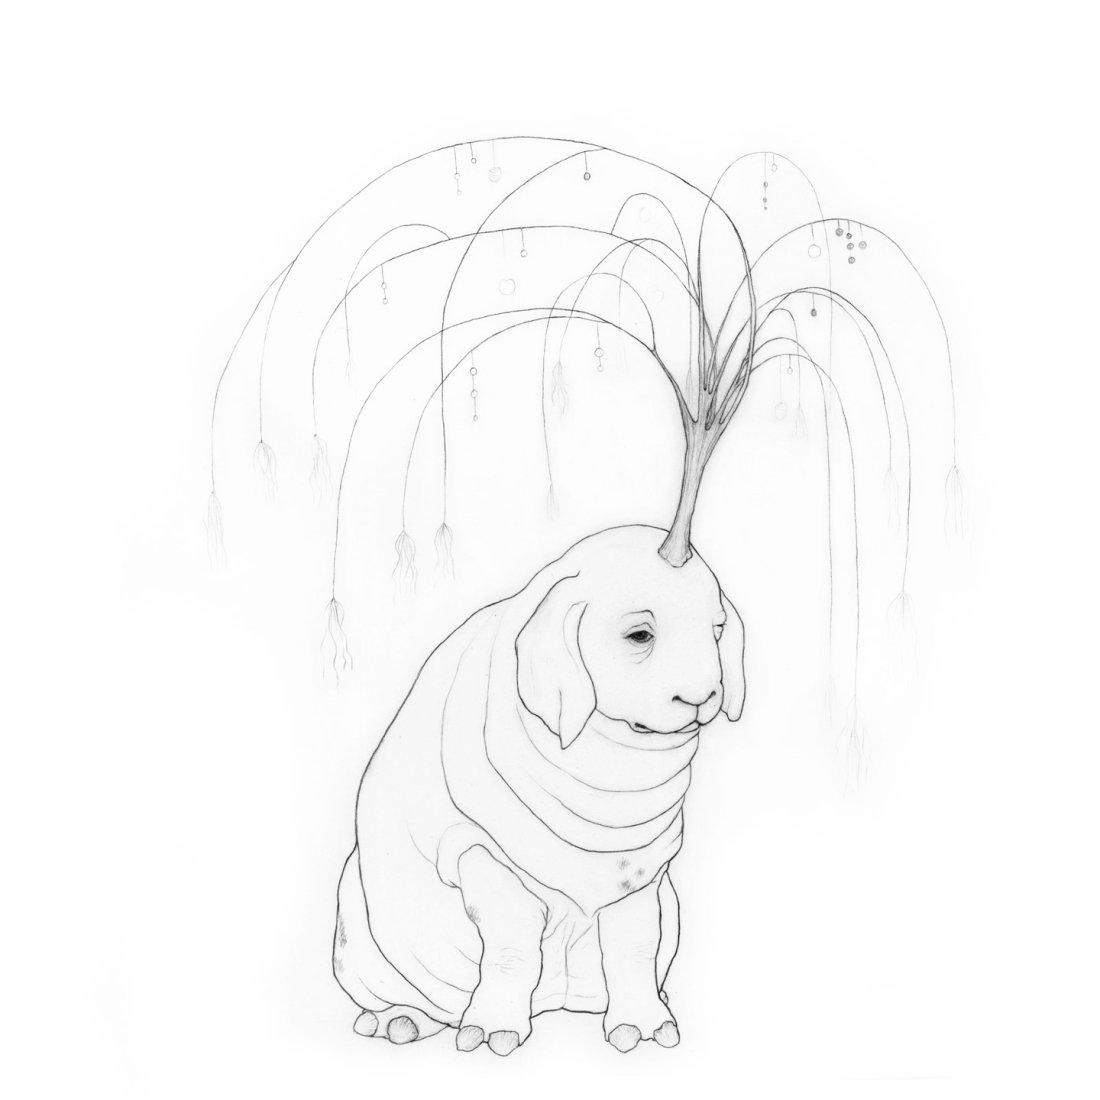 Daydreamer unicorn drawing - Karina Kalvaitis - all rights reserved